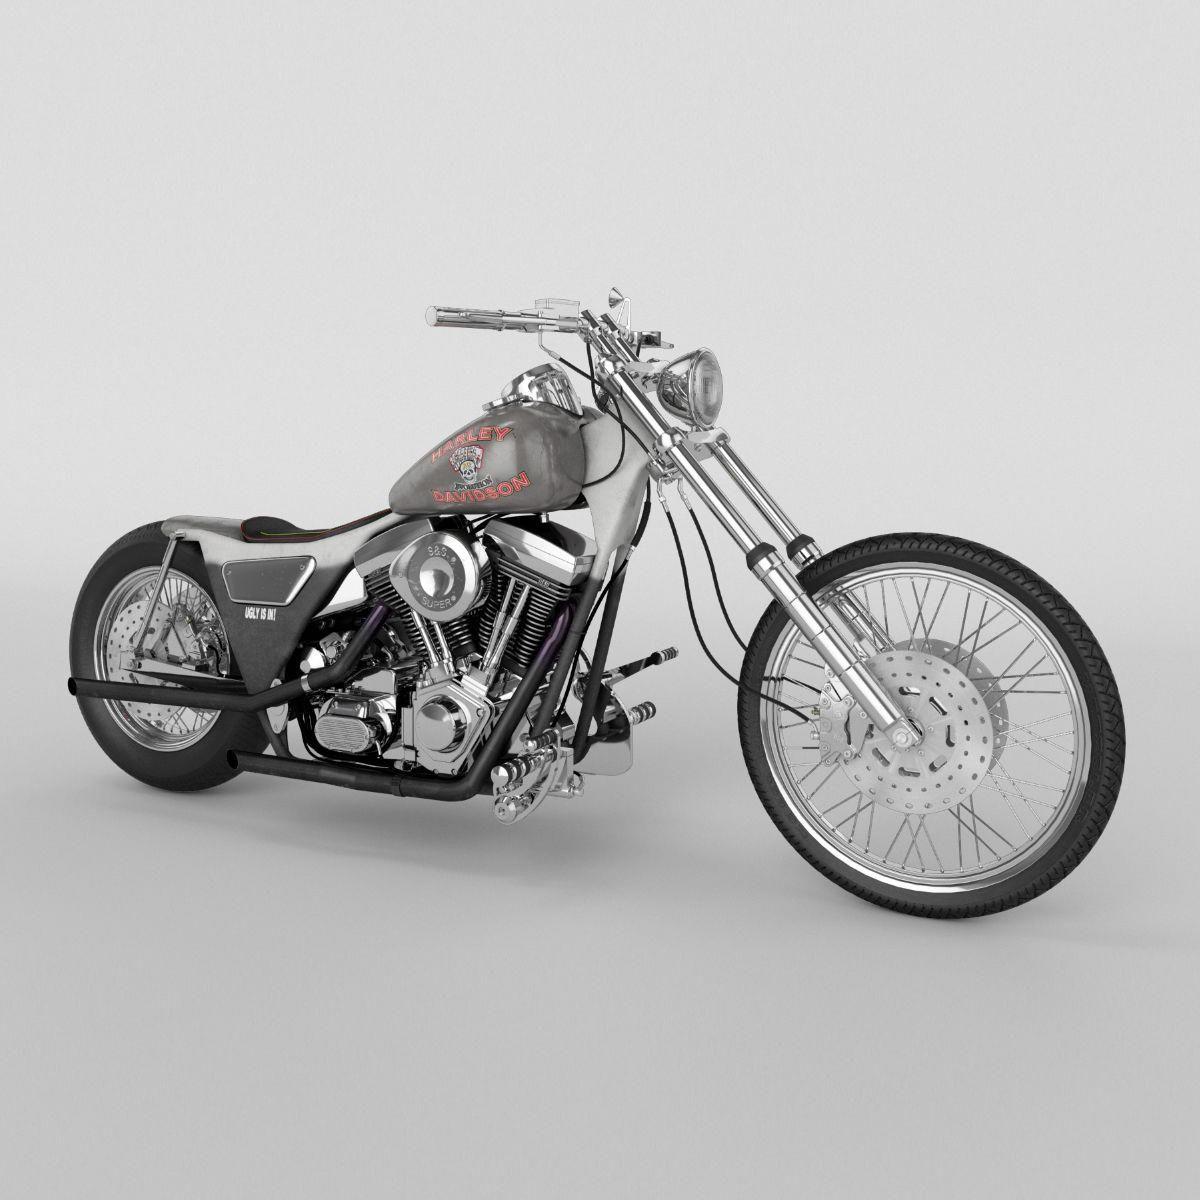 Harley Davidson FXR 1989 Custom 3D Model bikeaccessories